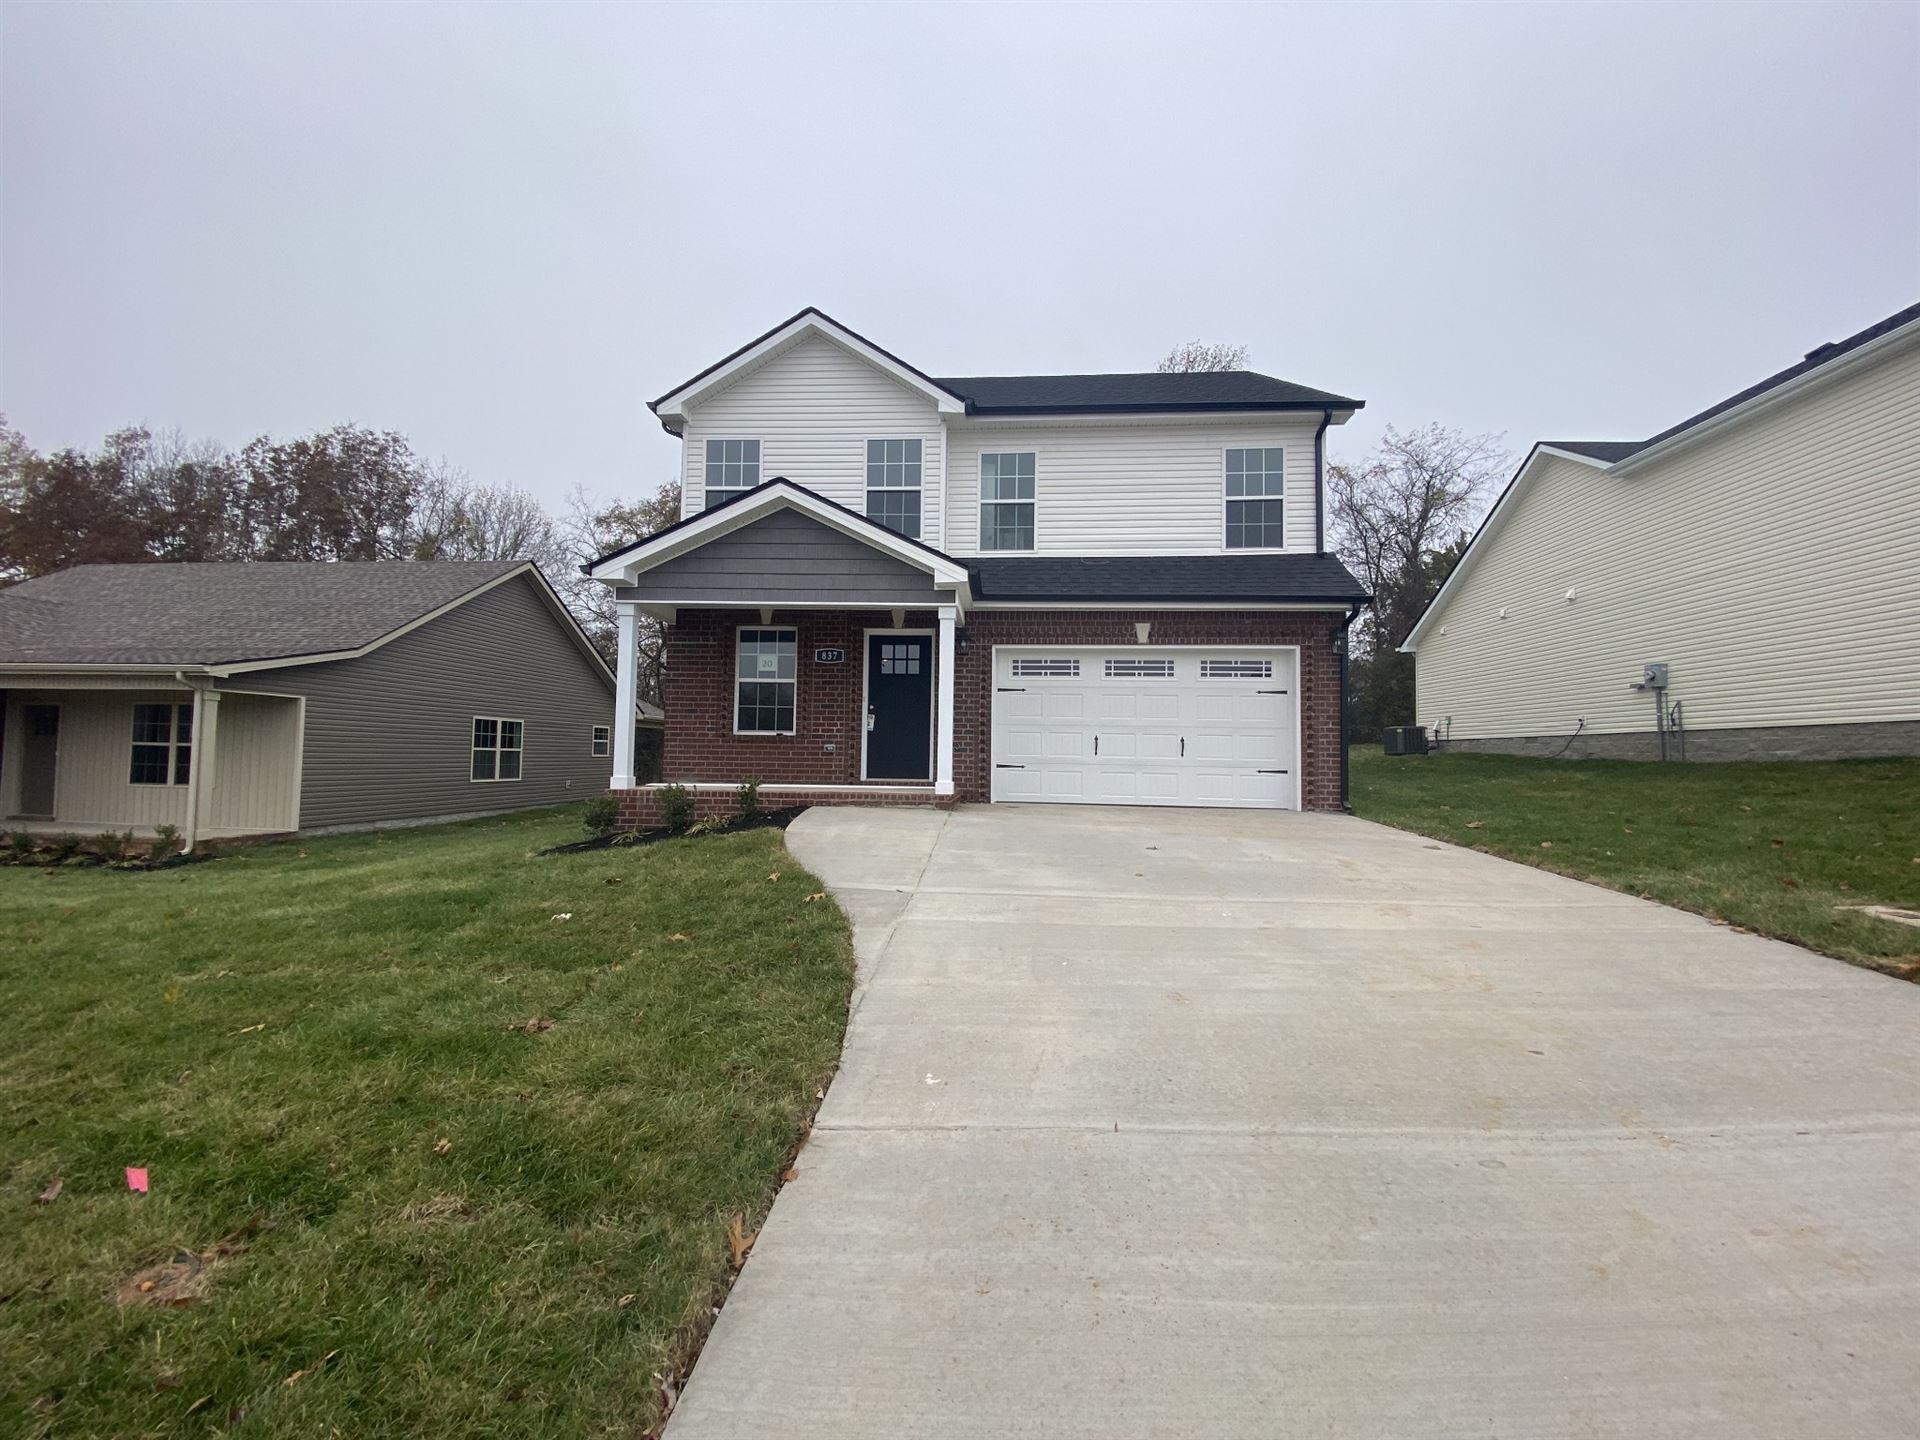 20 Irish Hills, Clarksville, TN 37042 - MLS#: 2274757